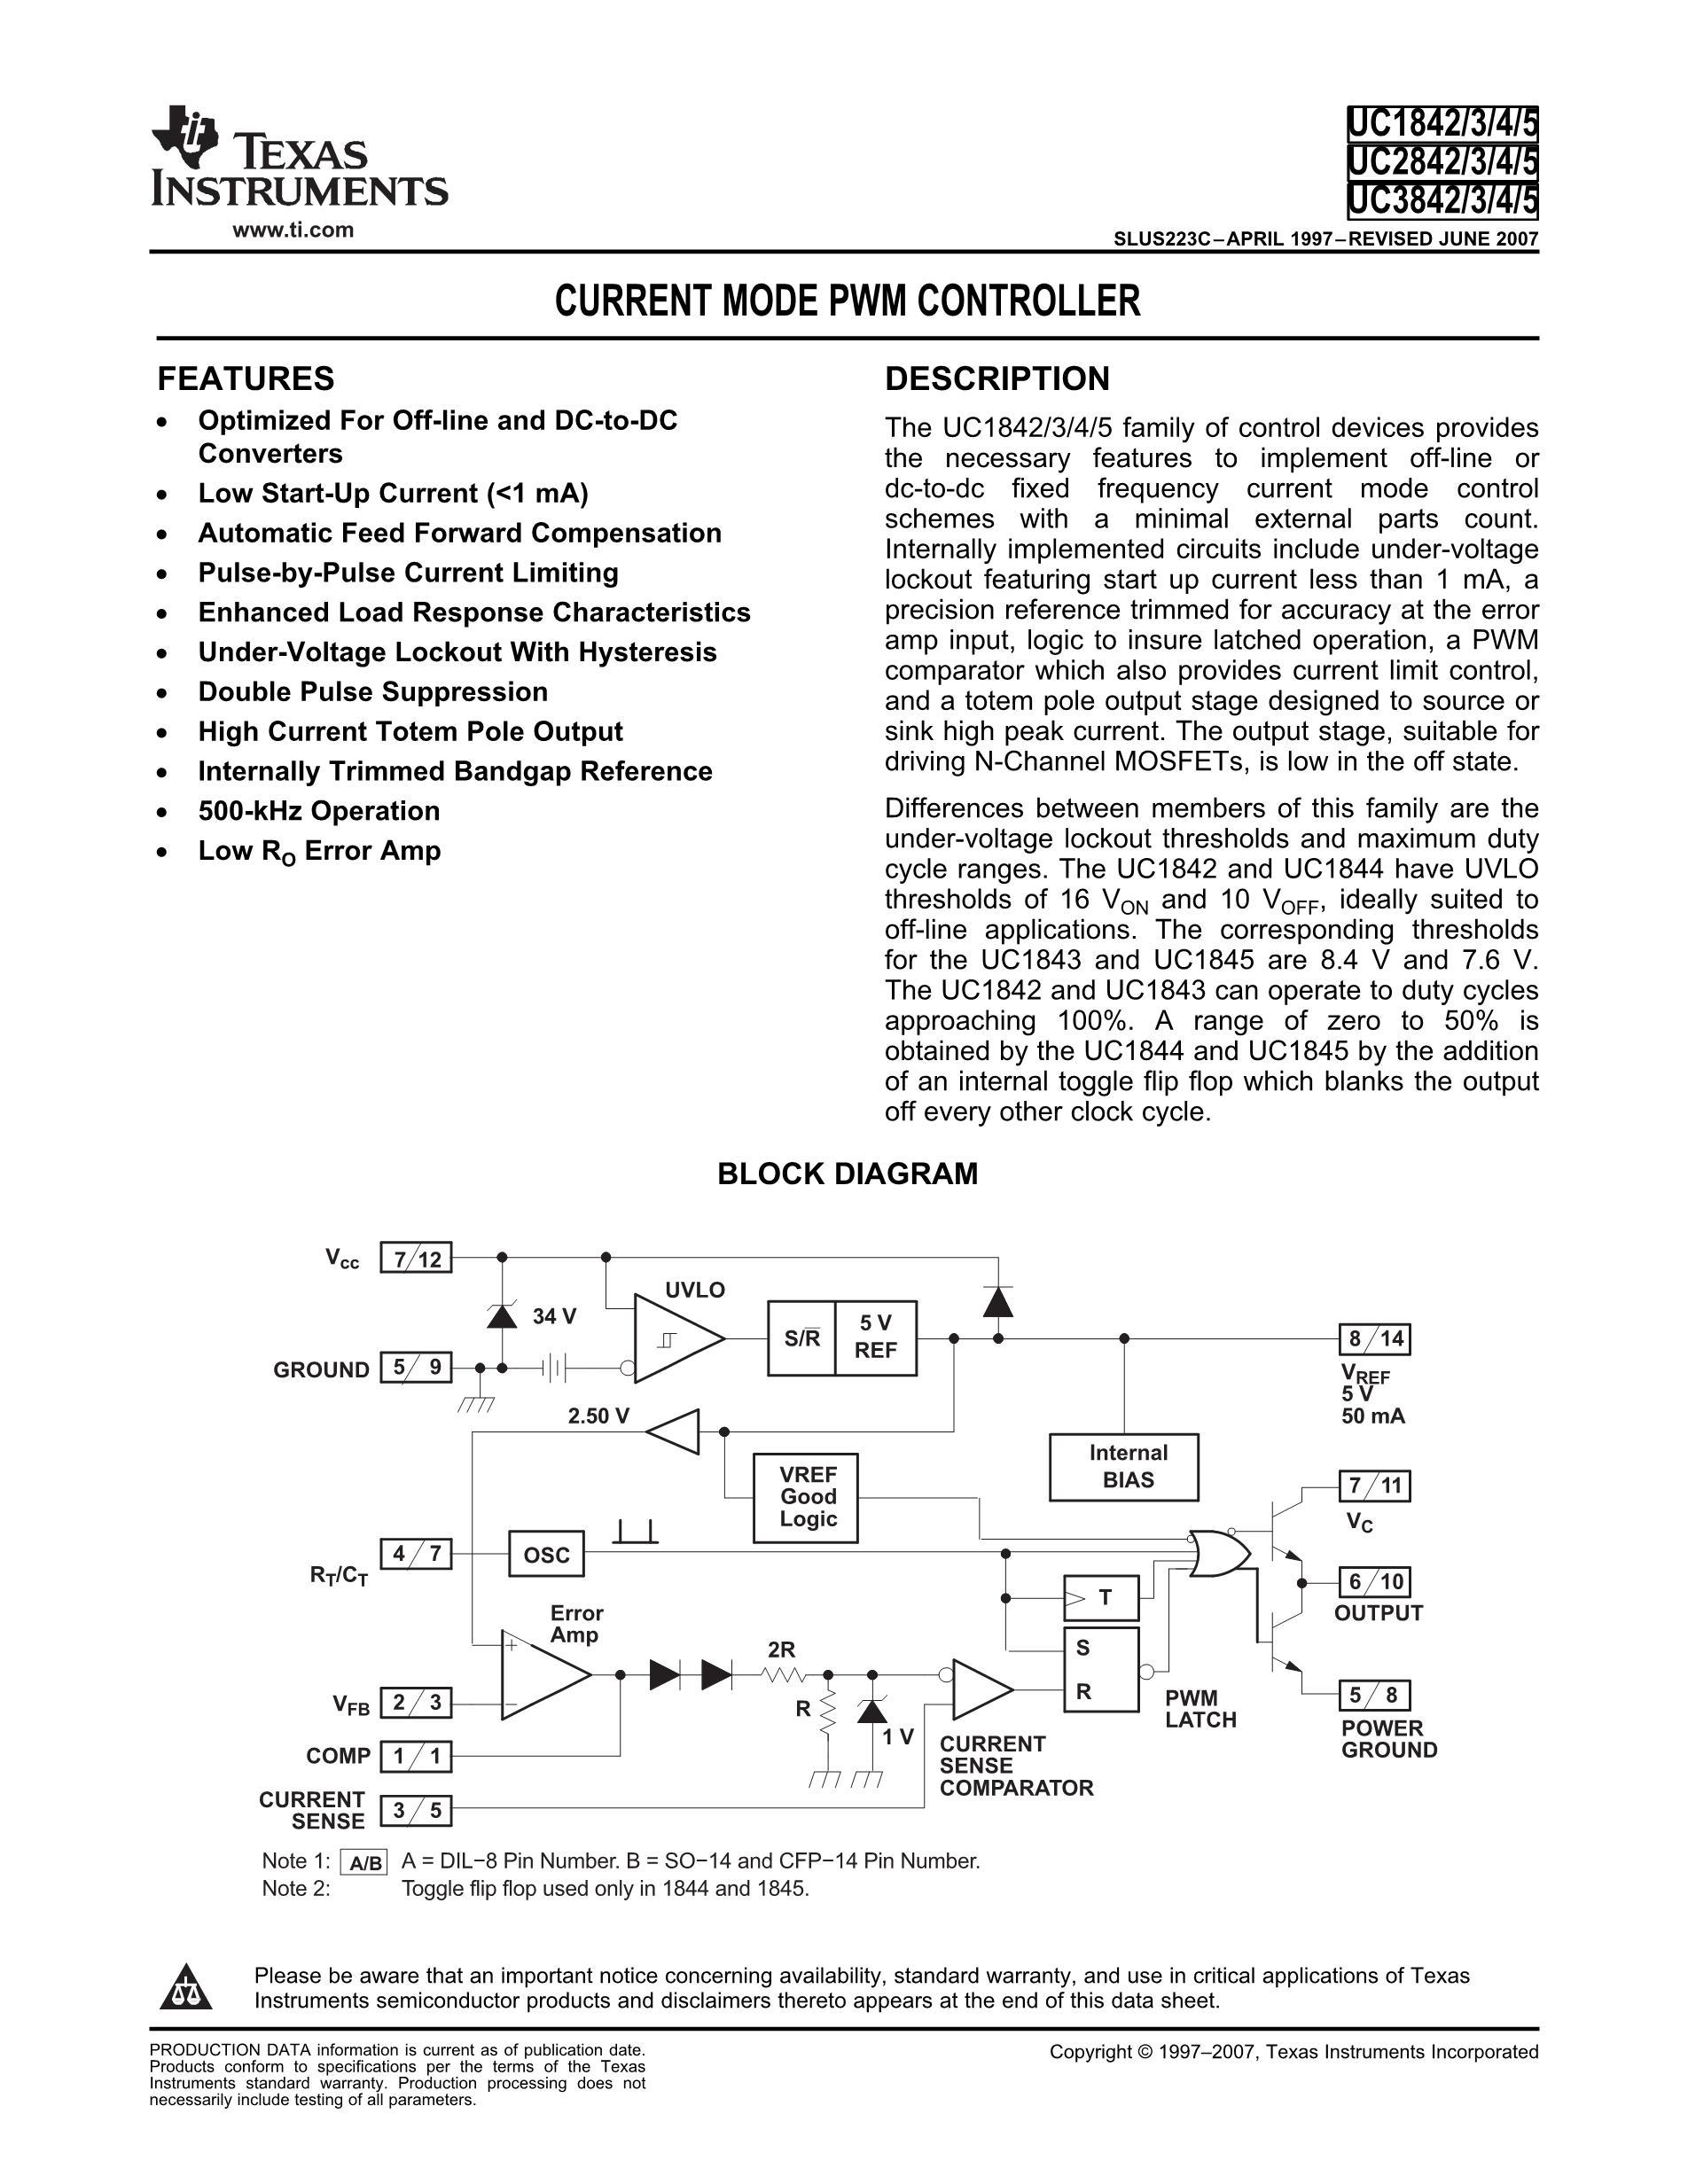 UC2836DTR's pdf picture 1